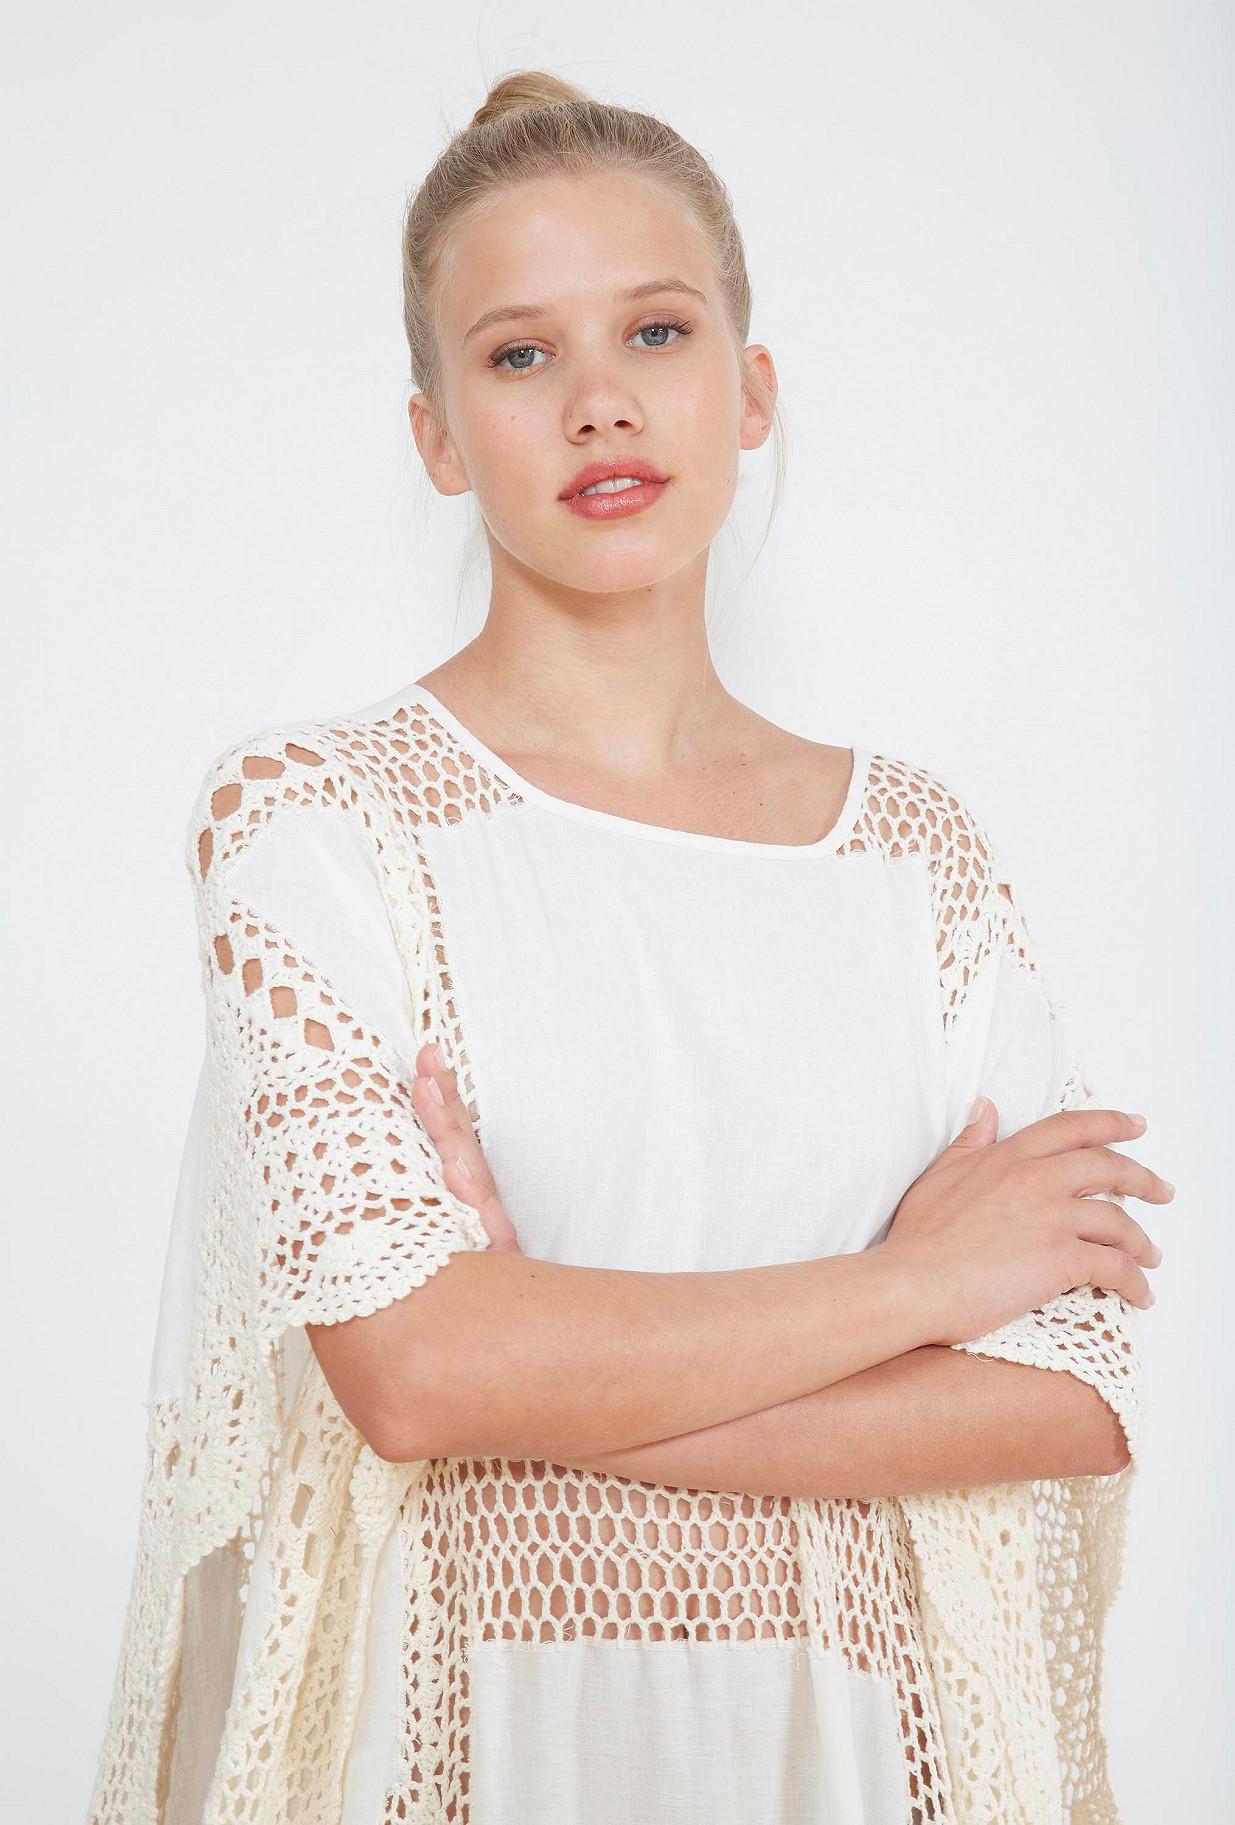 Ecru  PONCHO  Bovary Mes demoiselles fashion clothes designer Paris